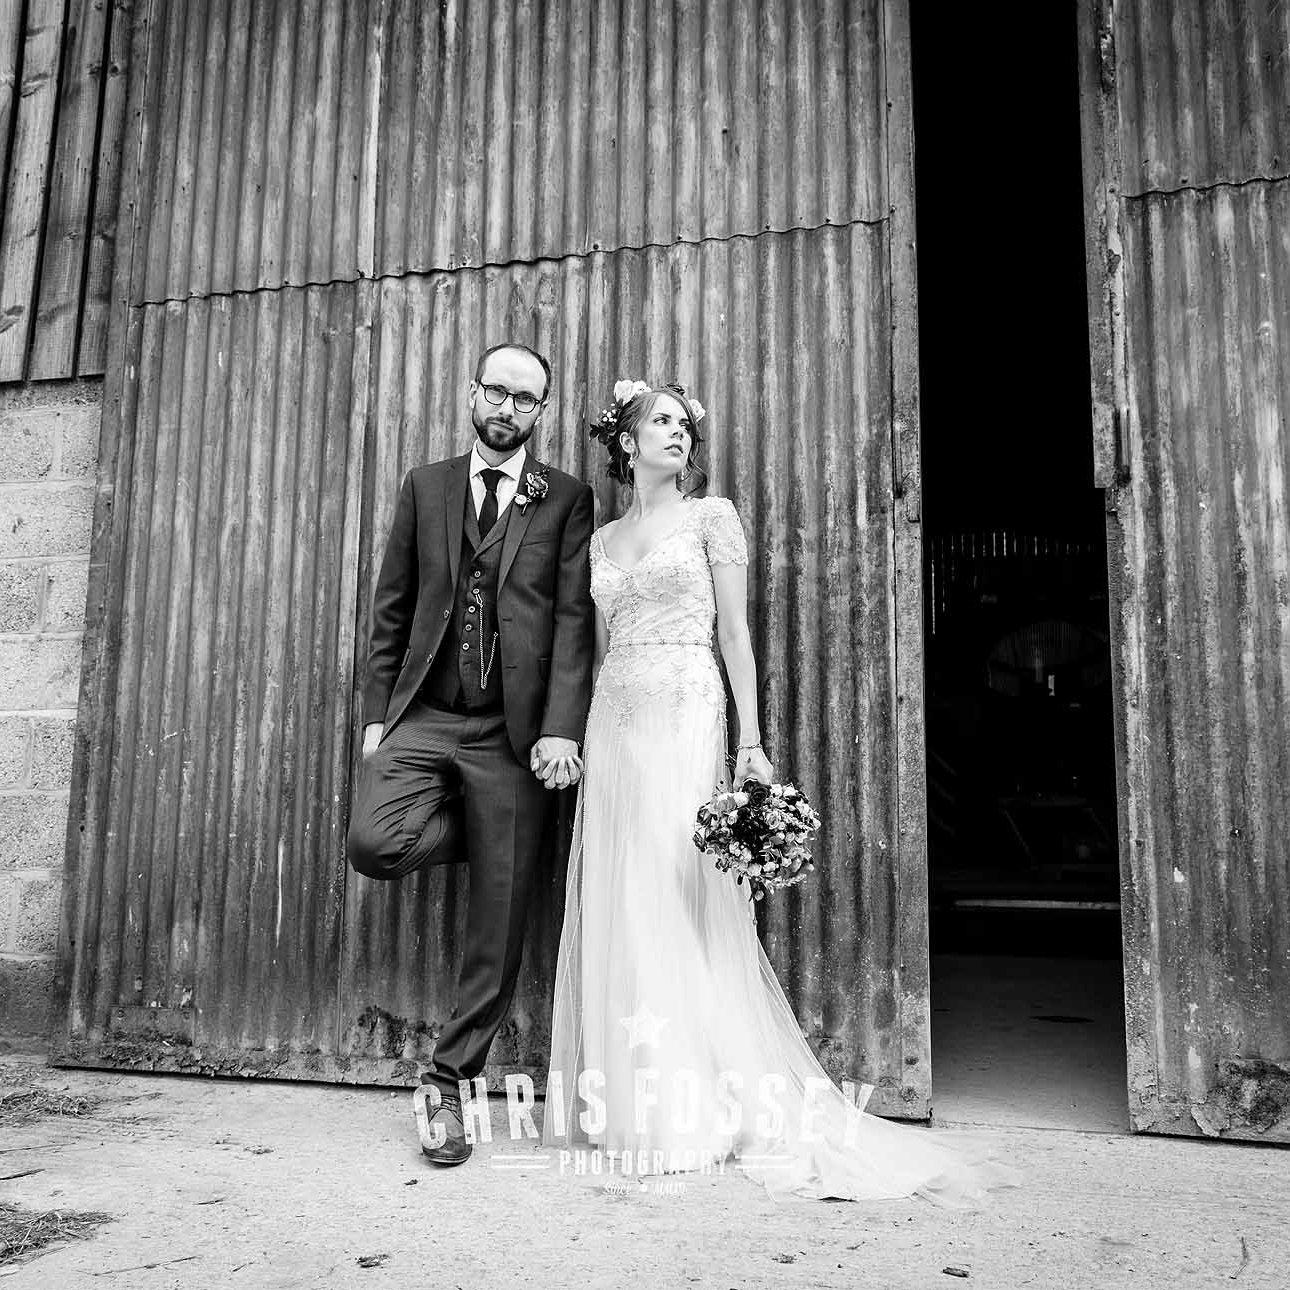 The-Barn-Upcote-Farm-Withington-Wedding-Photography-Gloucestershire-Lauren-Tom